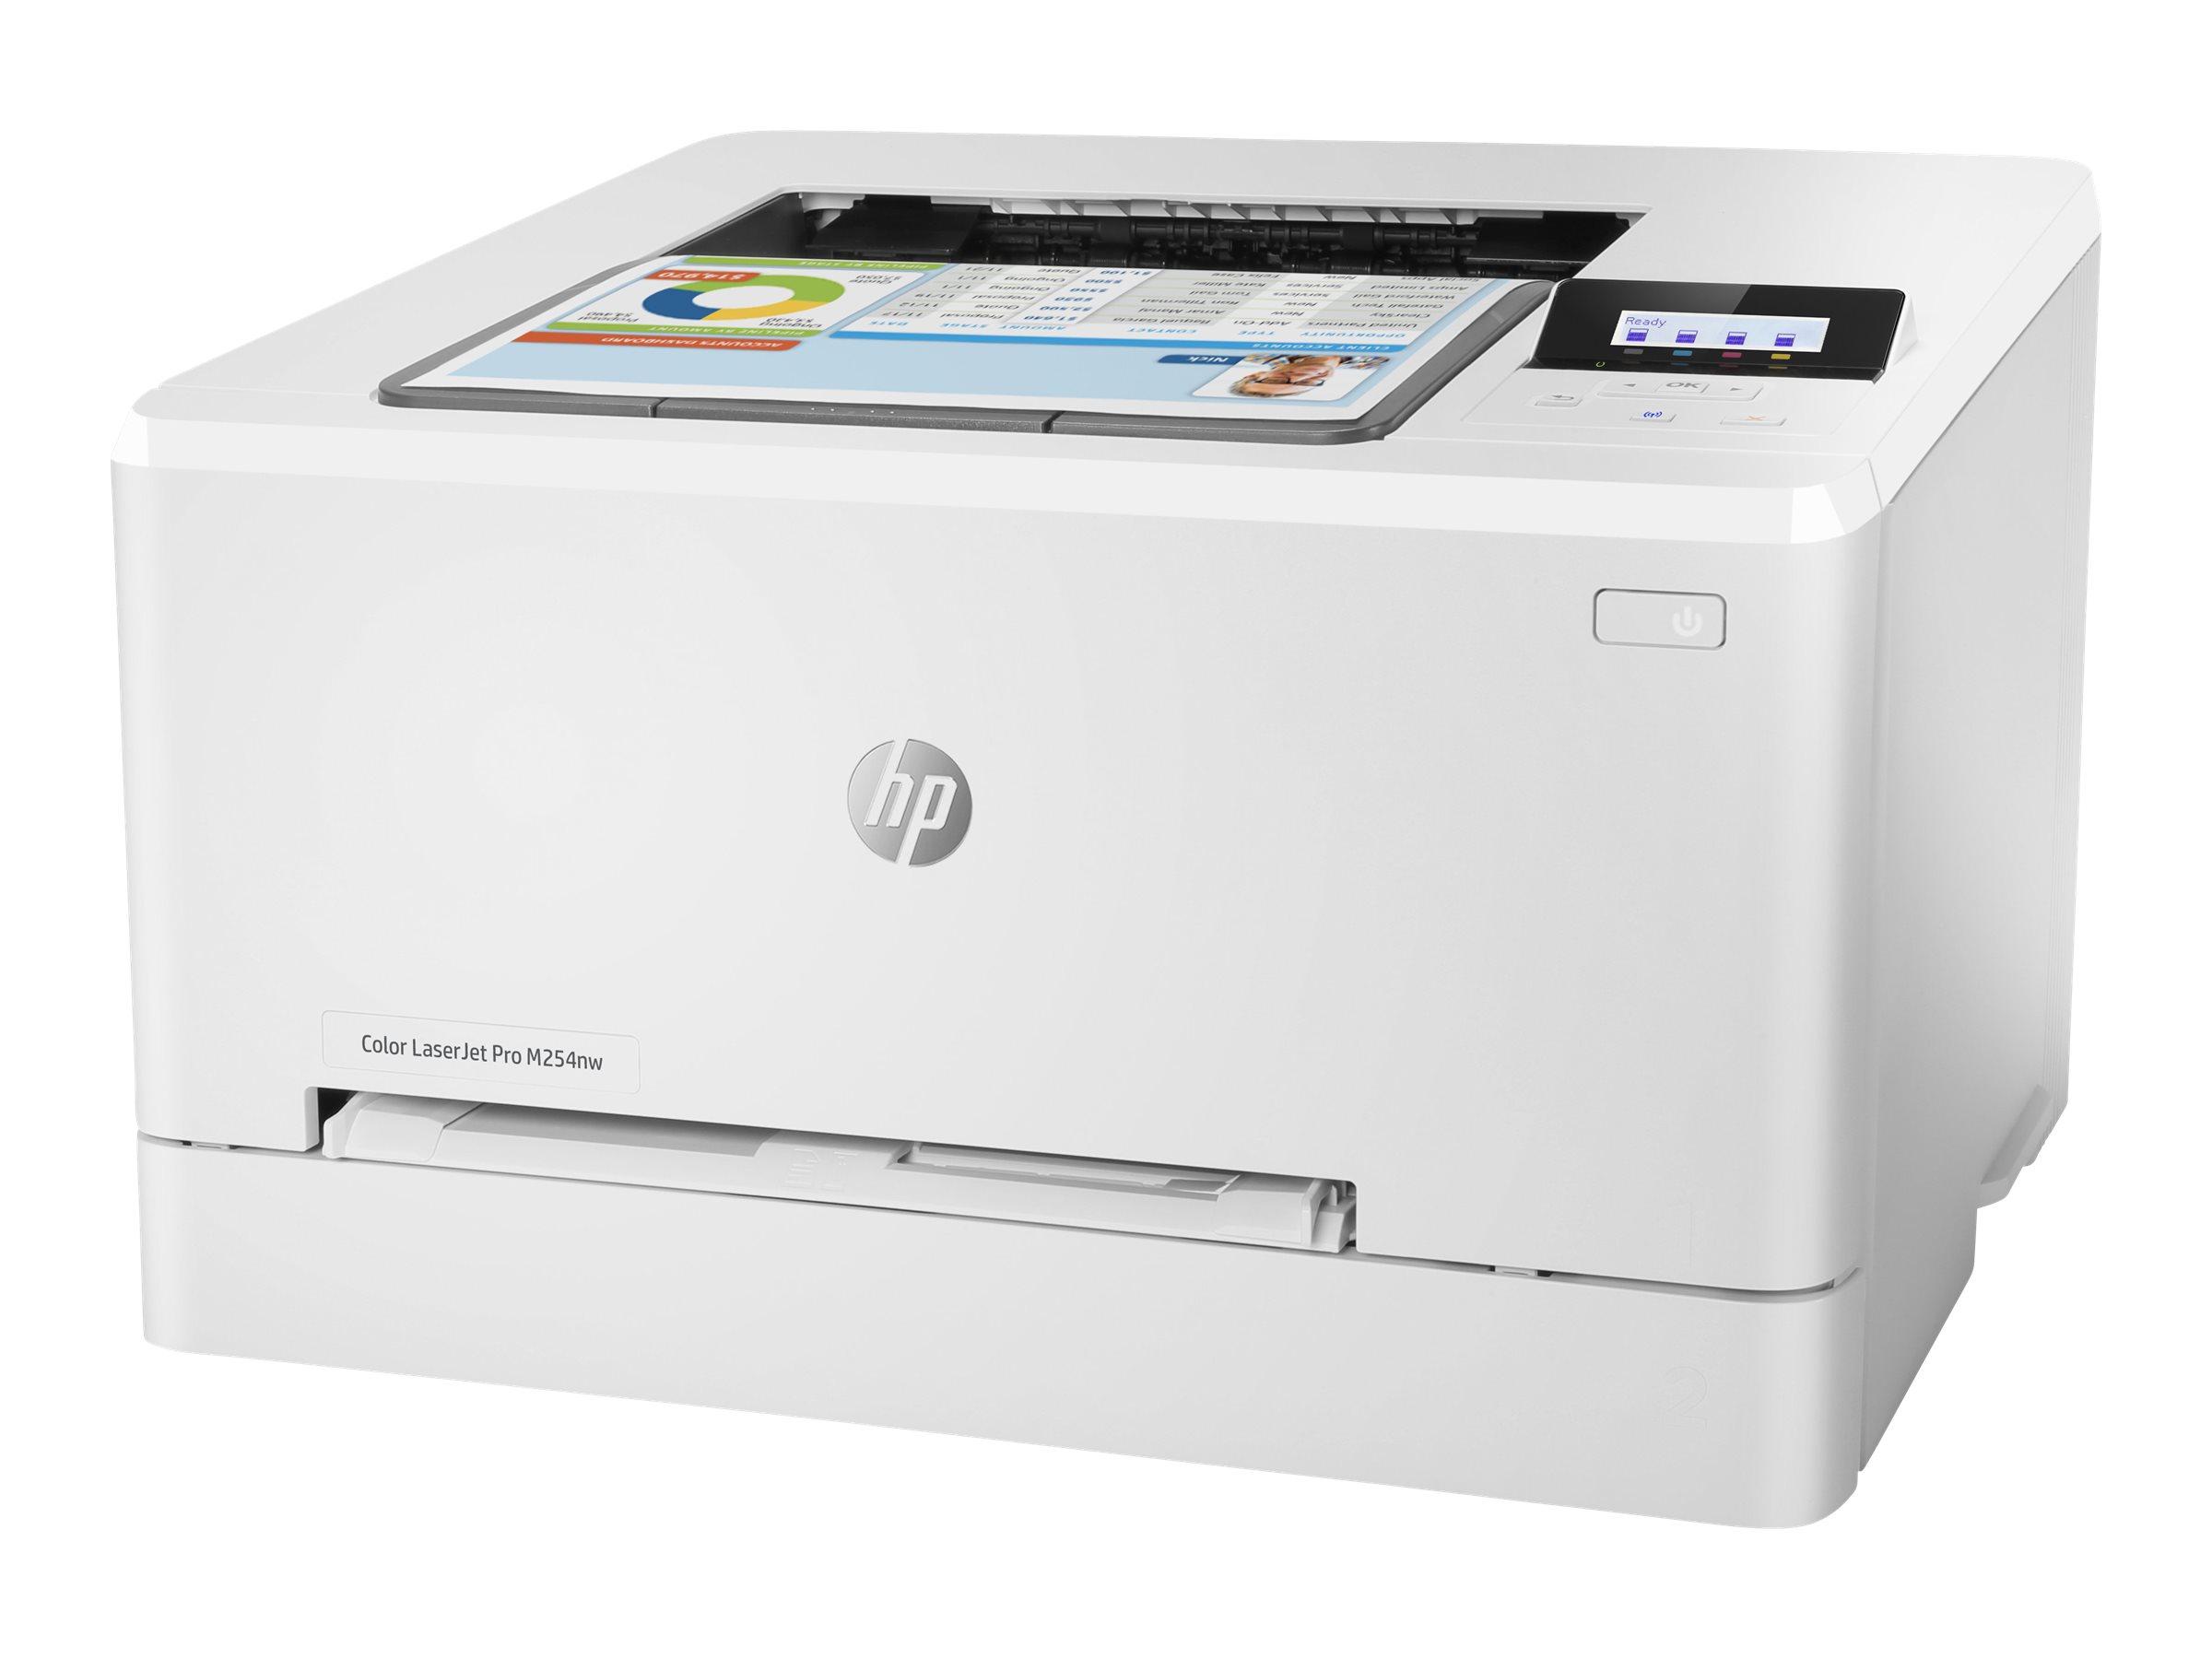 HP Color LaserJet Pro M254nw - Drucker - Farbe - Laser - A4/Legal - 600 x 600 dpi